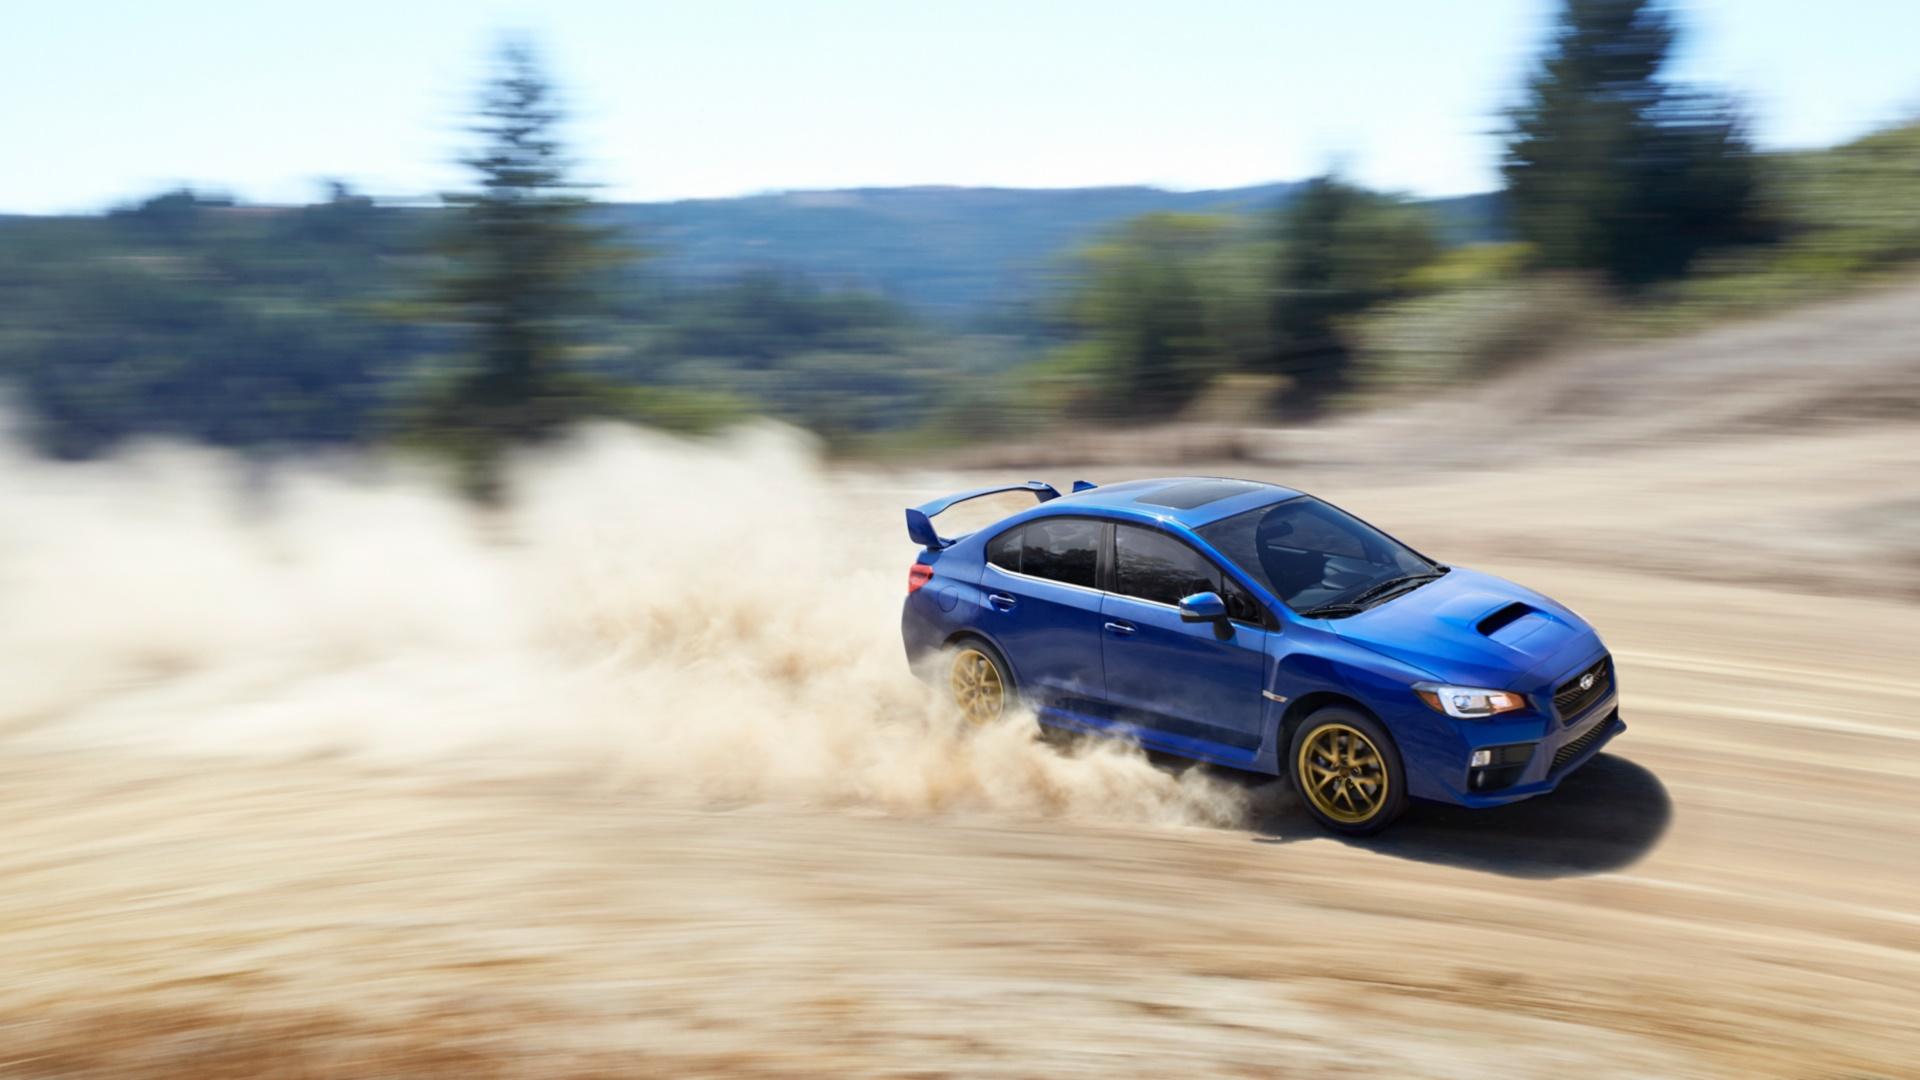 2015 Subaru Wrx Sti Hd Wallpaper Background Image 1920x1080 Id